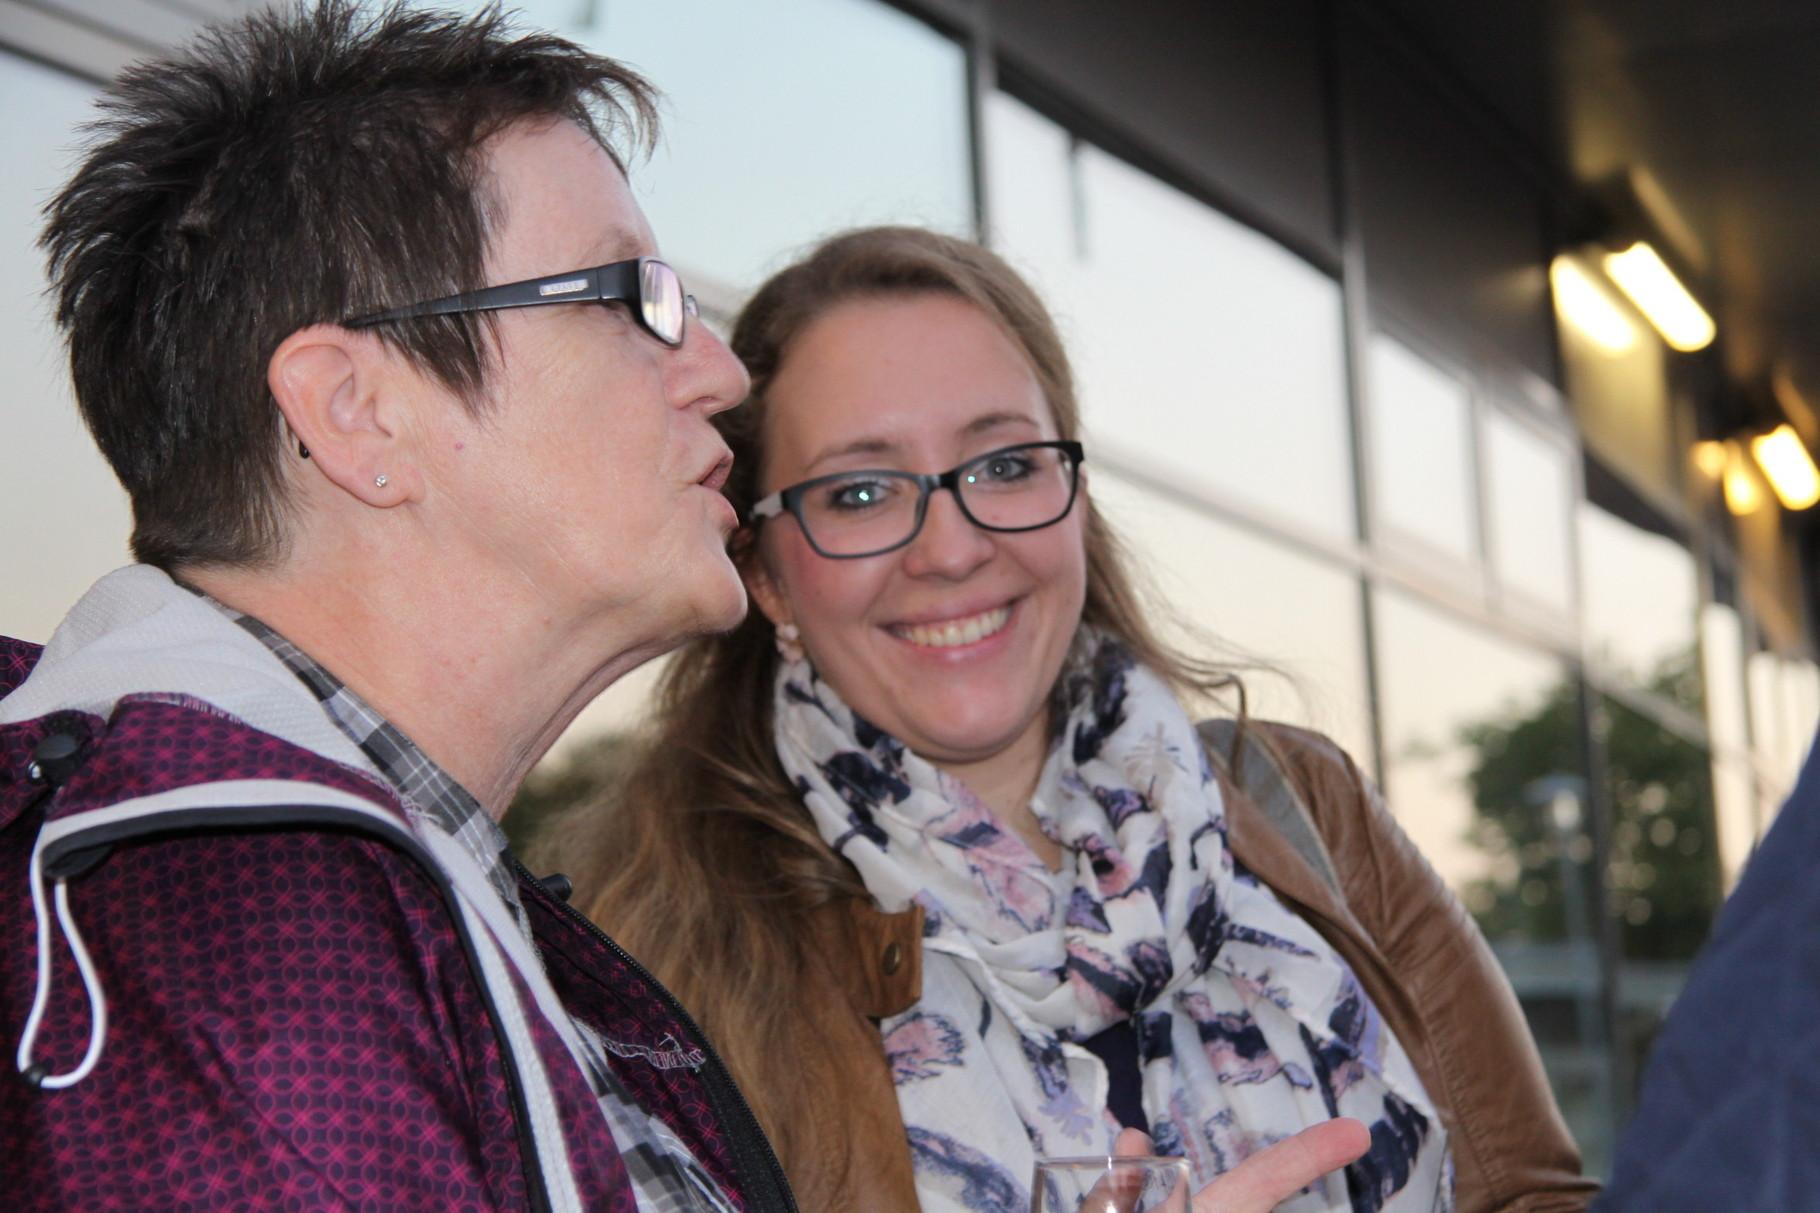 Marita Bull, PHYSIO FITNESS B2.0 , und Jasmin Poschmann aus Elstorf